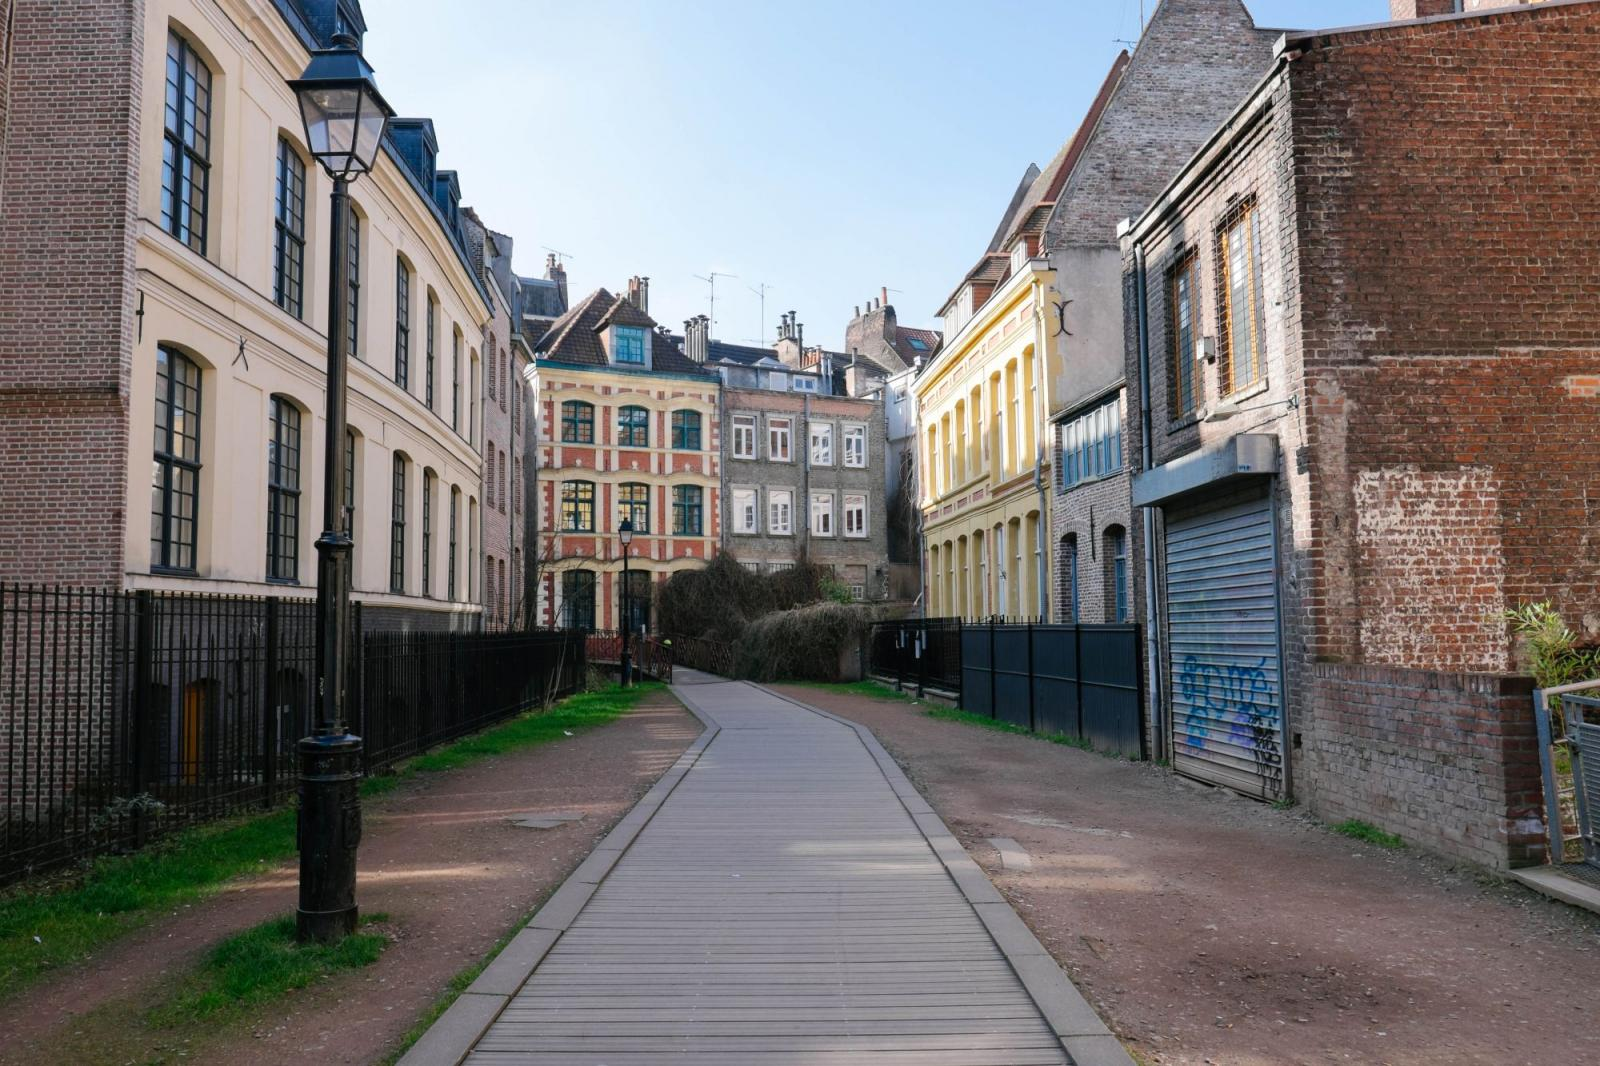 Rue-de-Weppes Lille